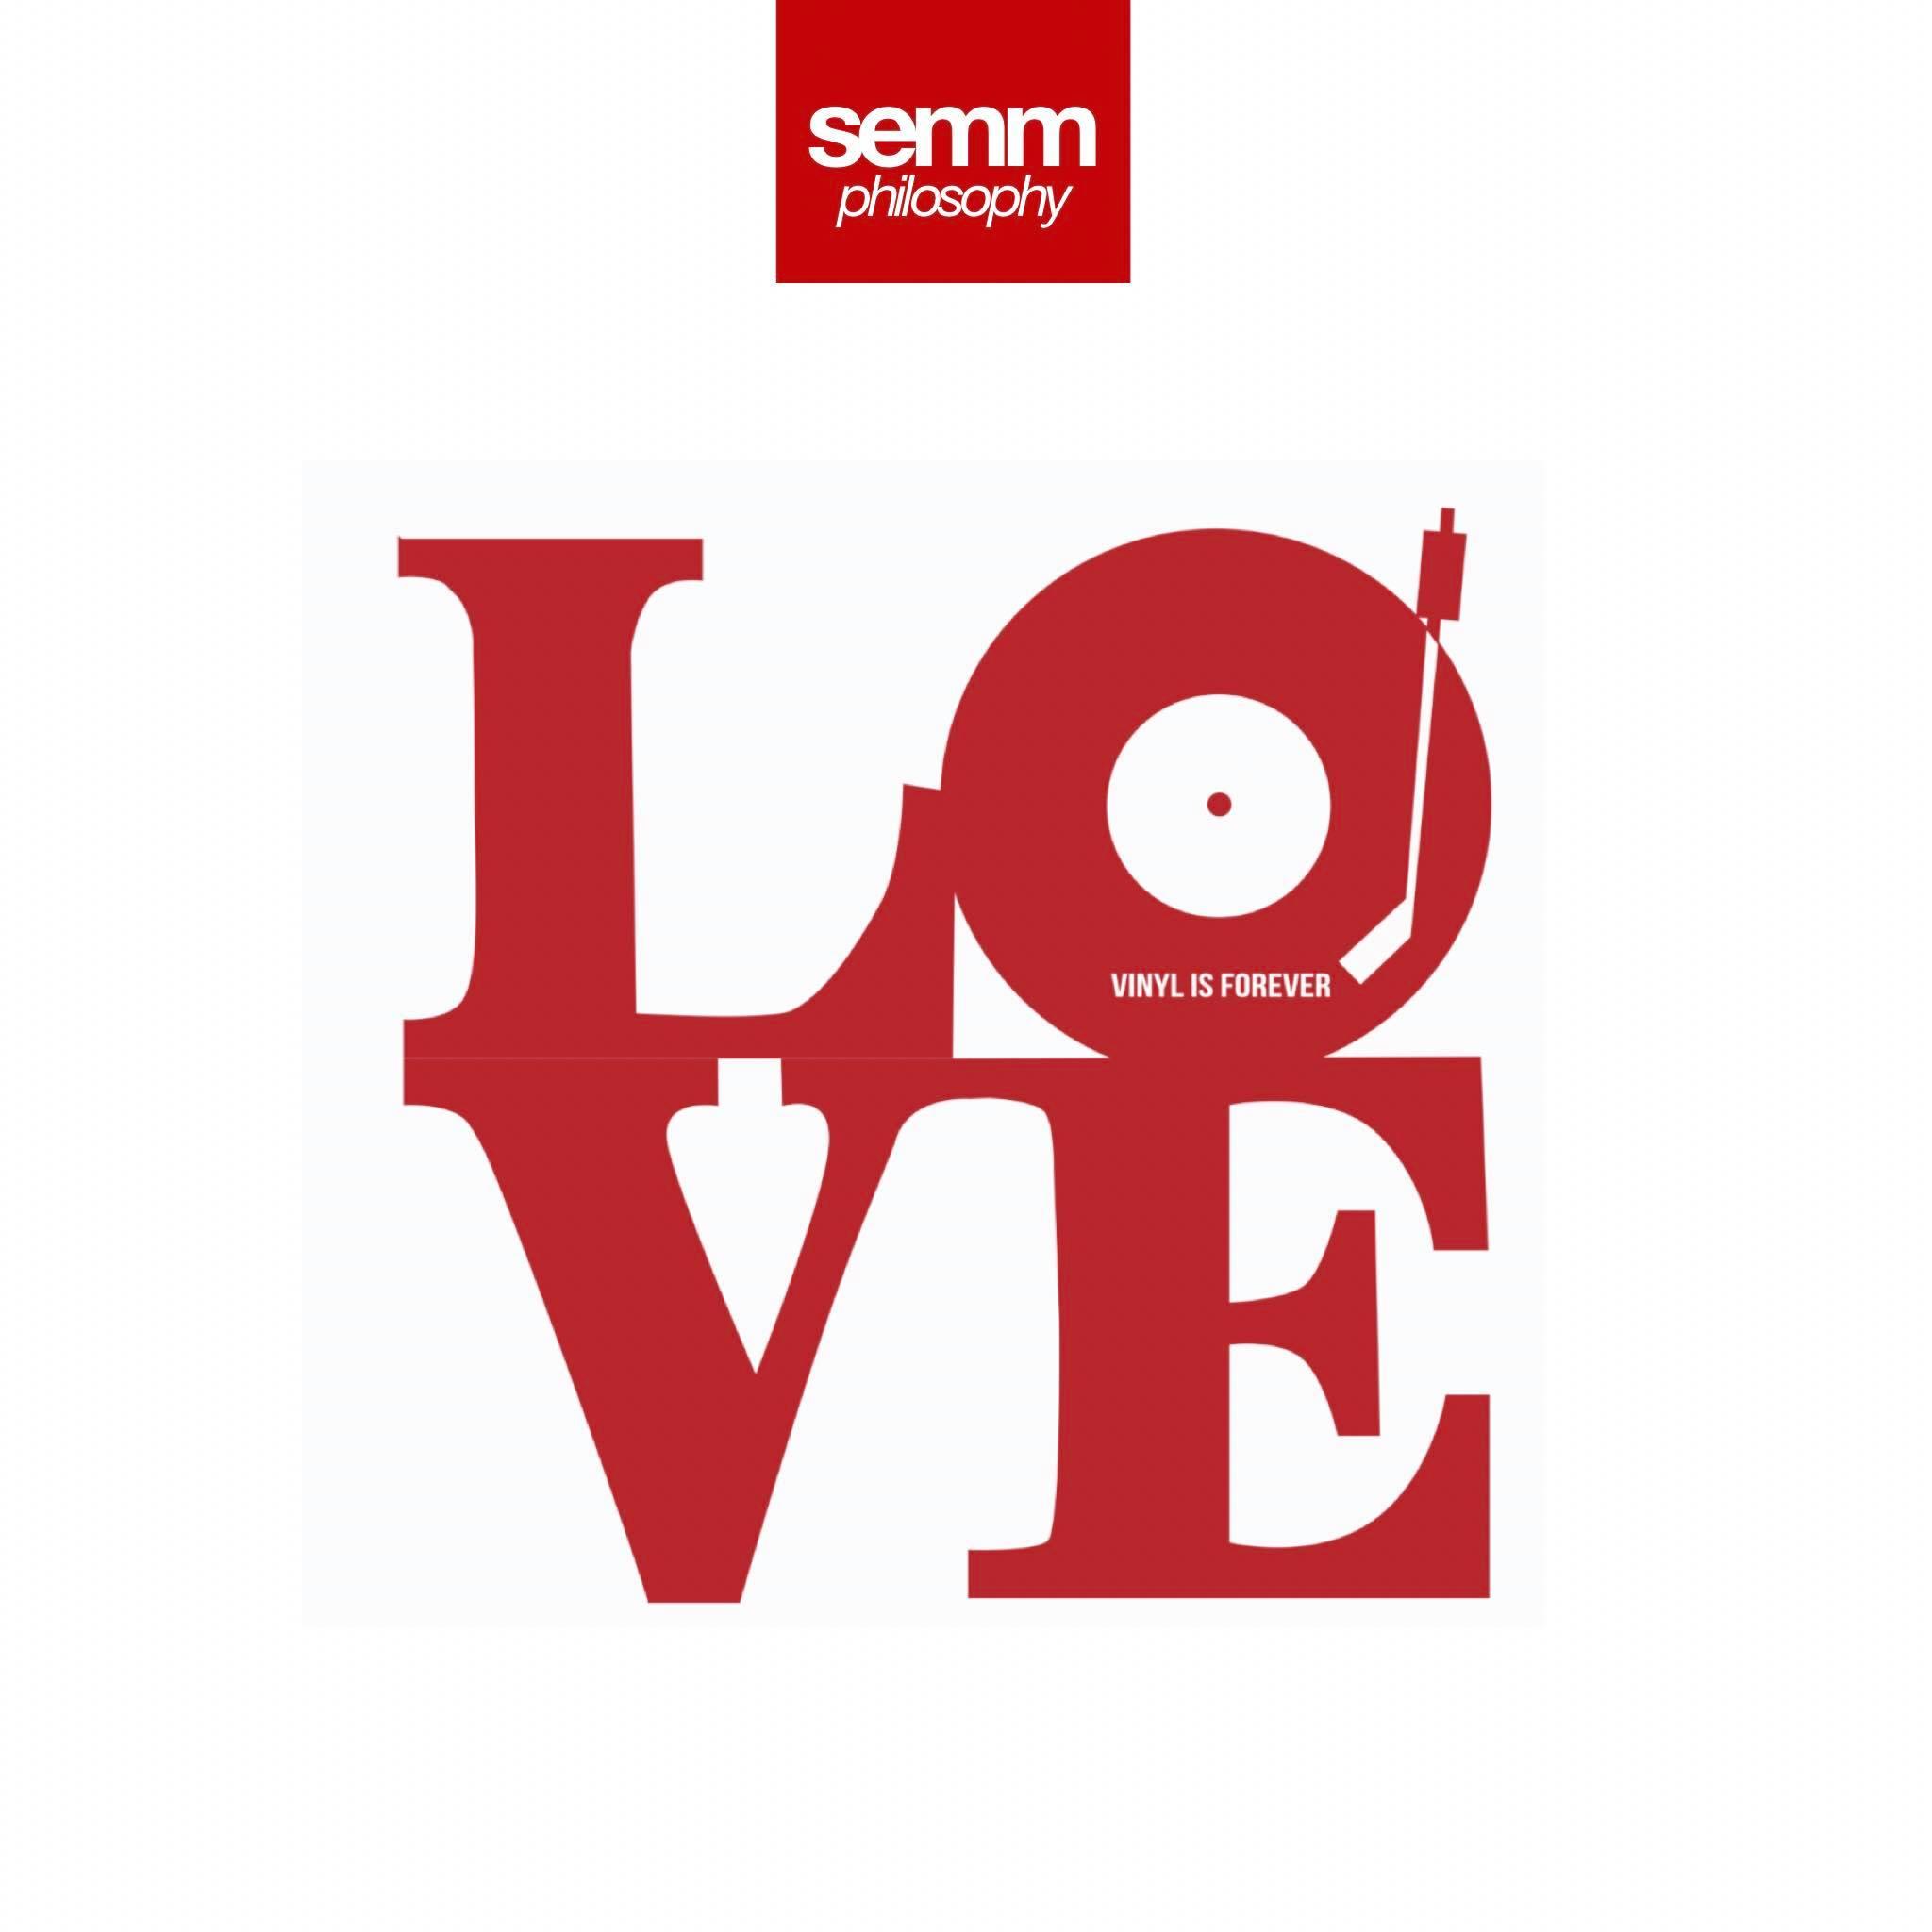 Semm Music Store Philosophy